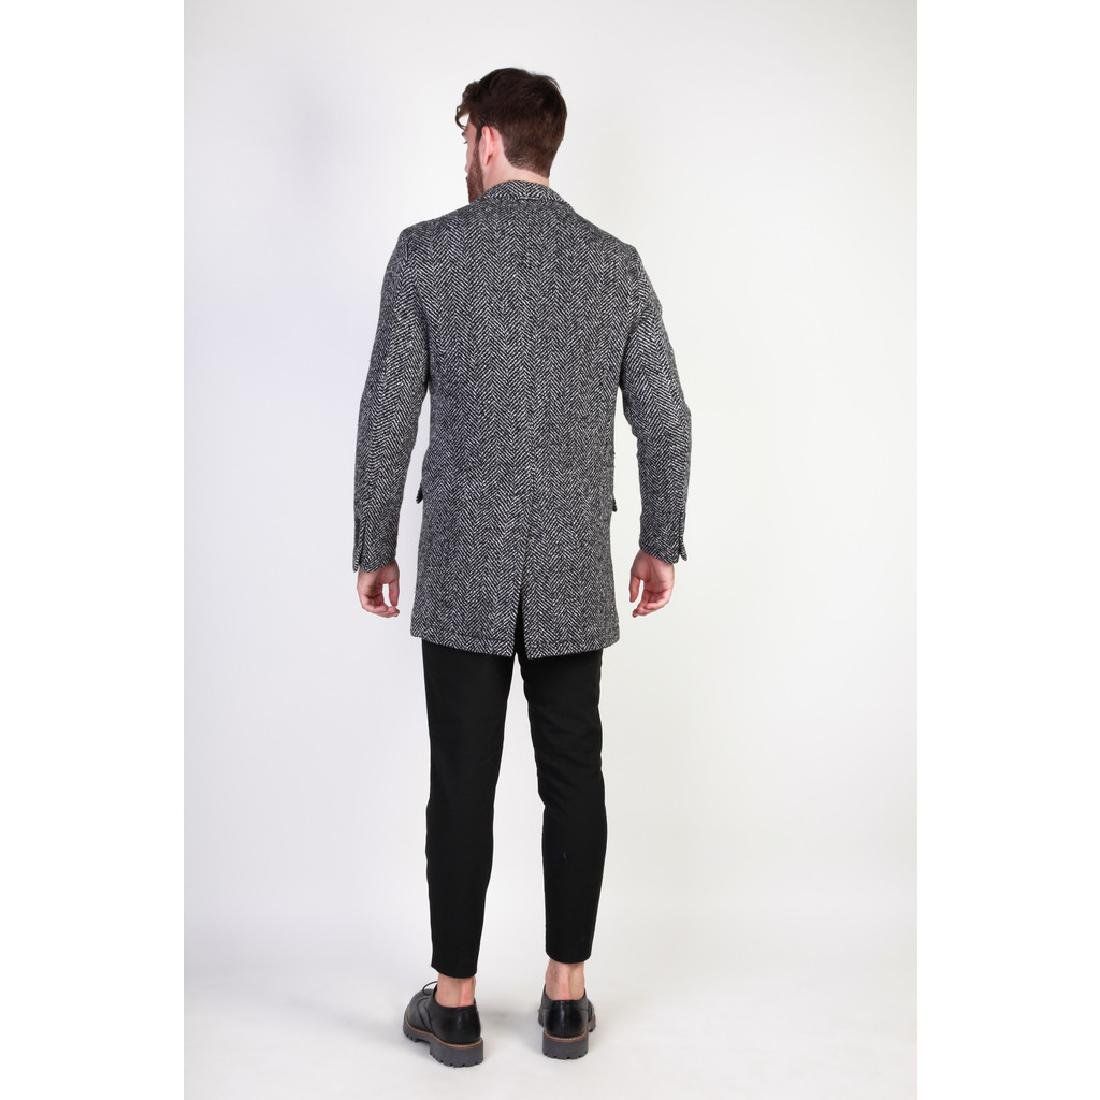 New Men's Italian Wool Blend Coat US 40 - 4